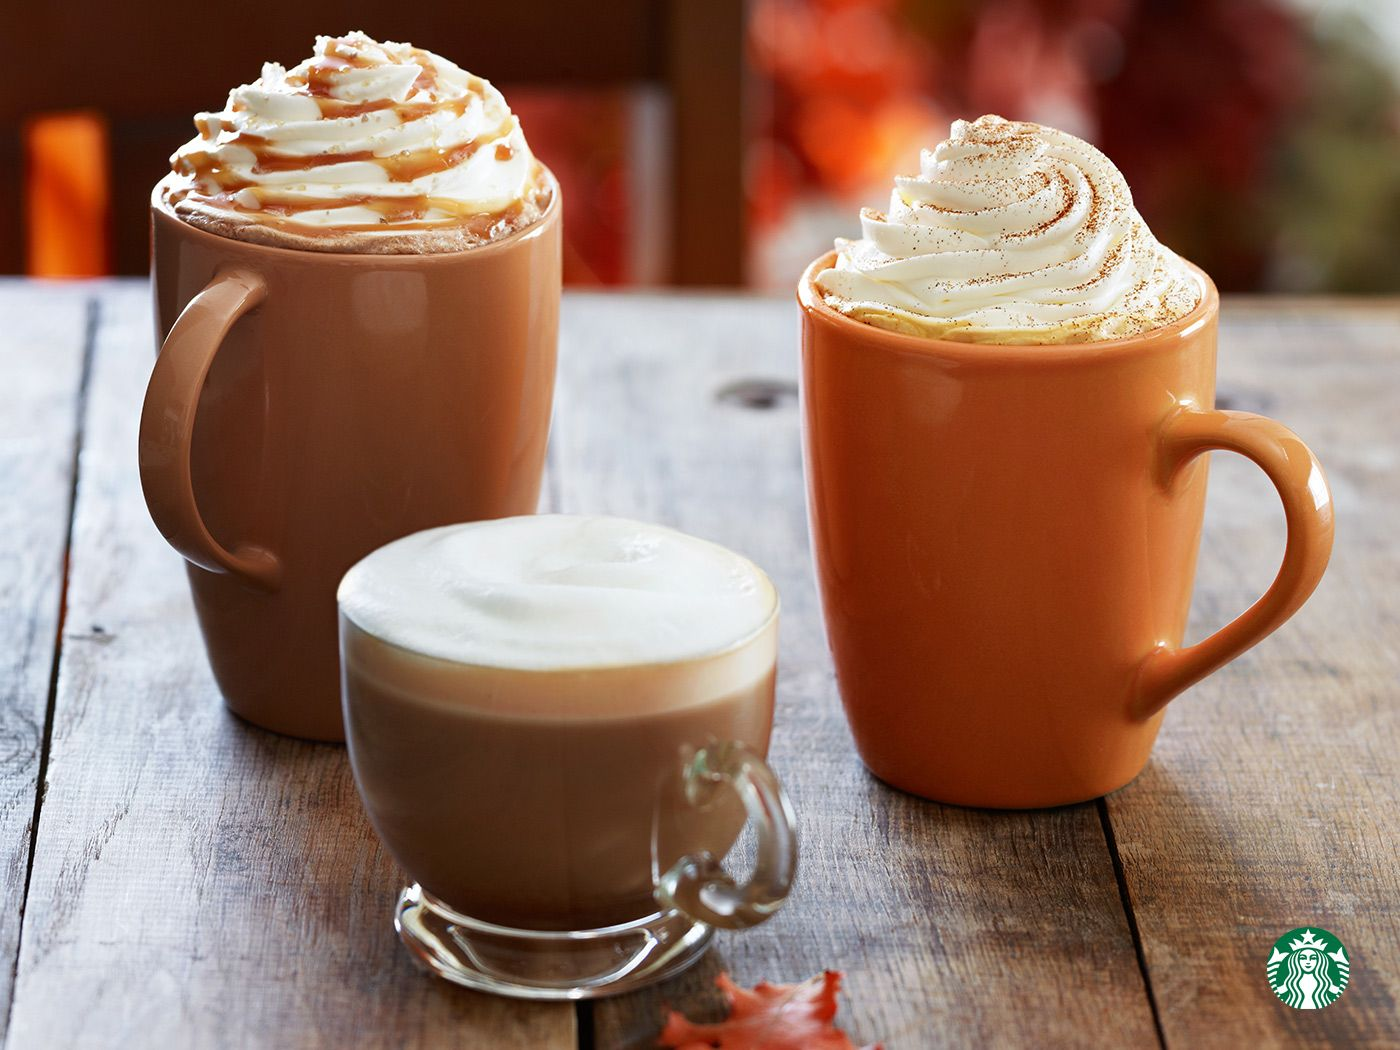 Buy Café Coffee Day Buy 1 Get 1 Vouchers Amazing